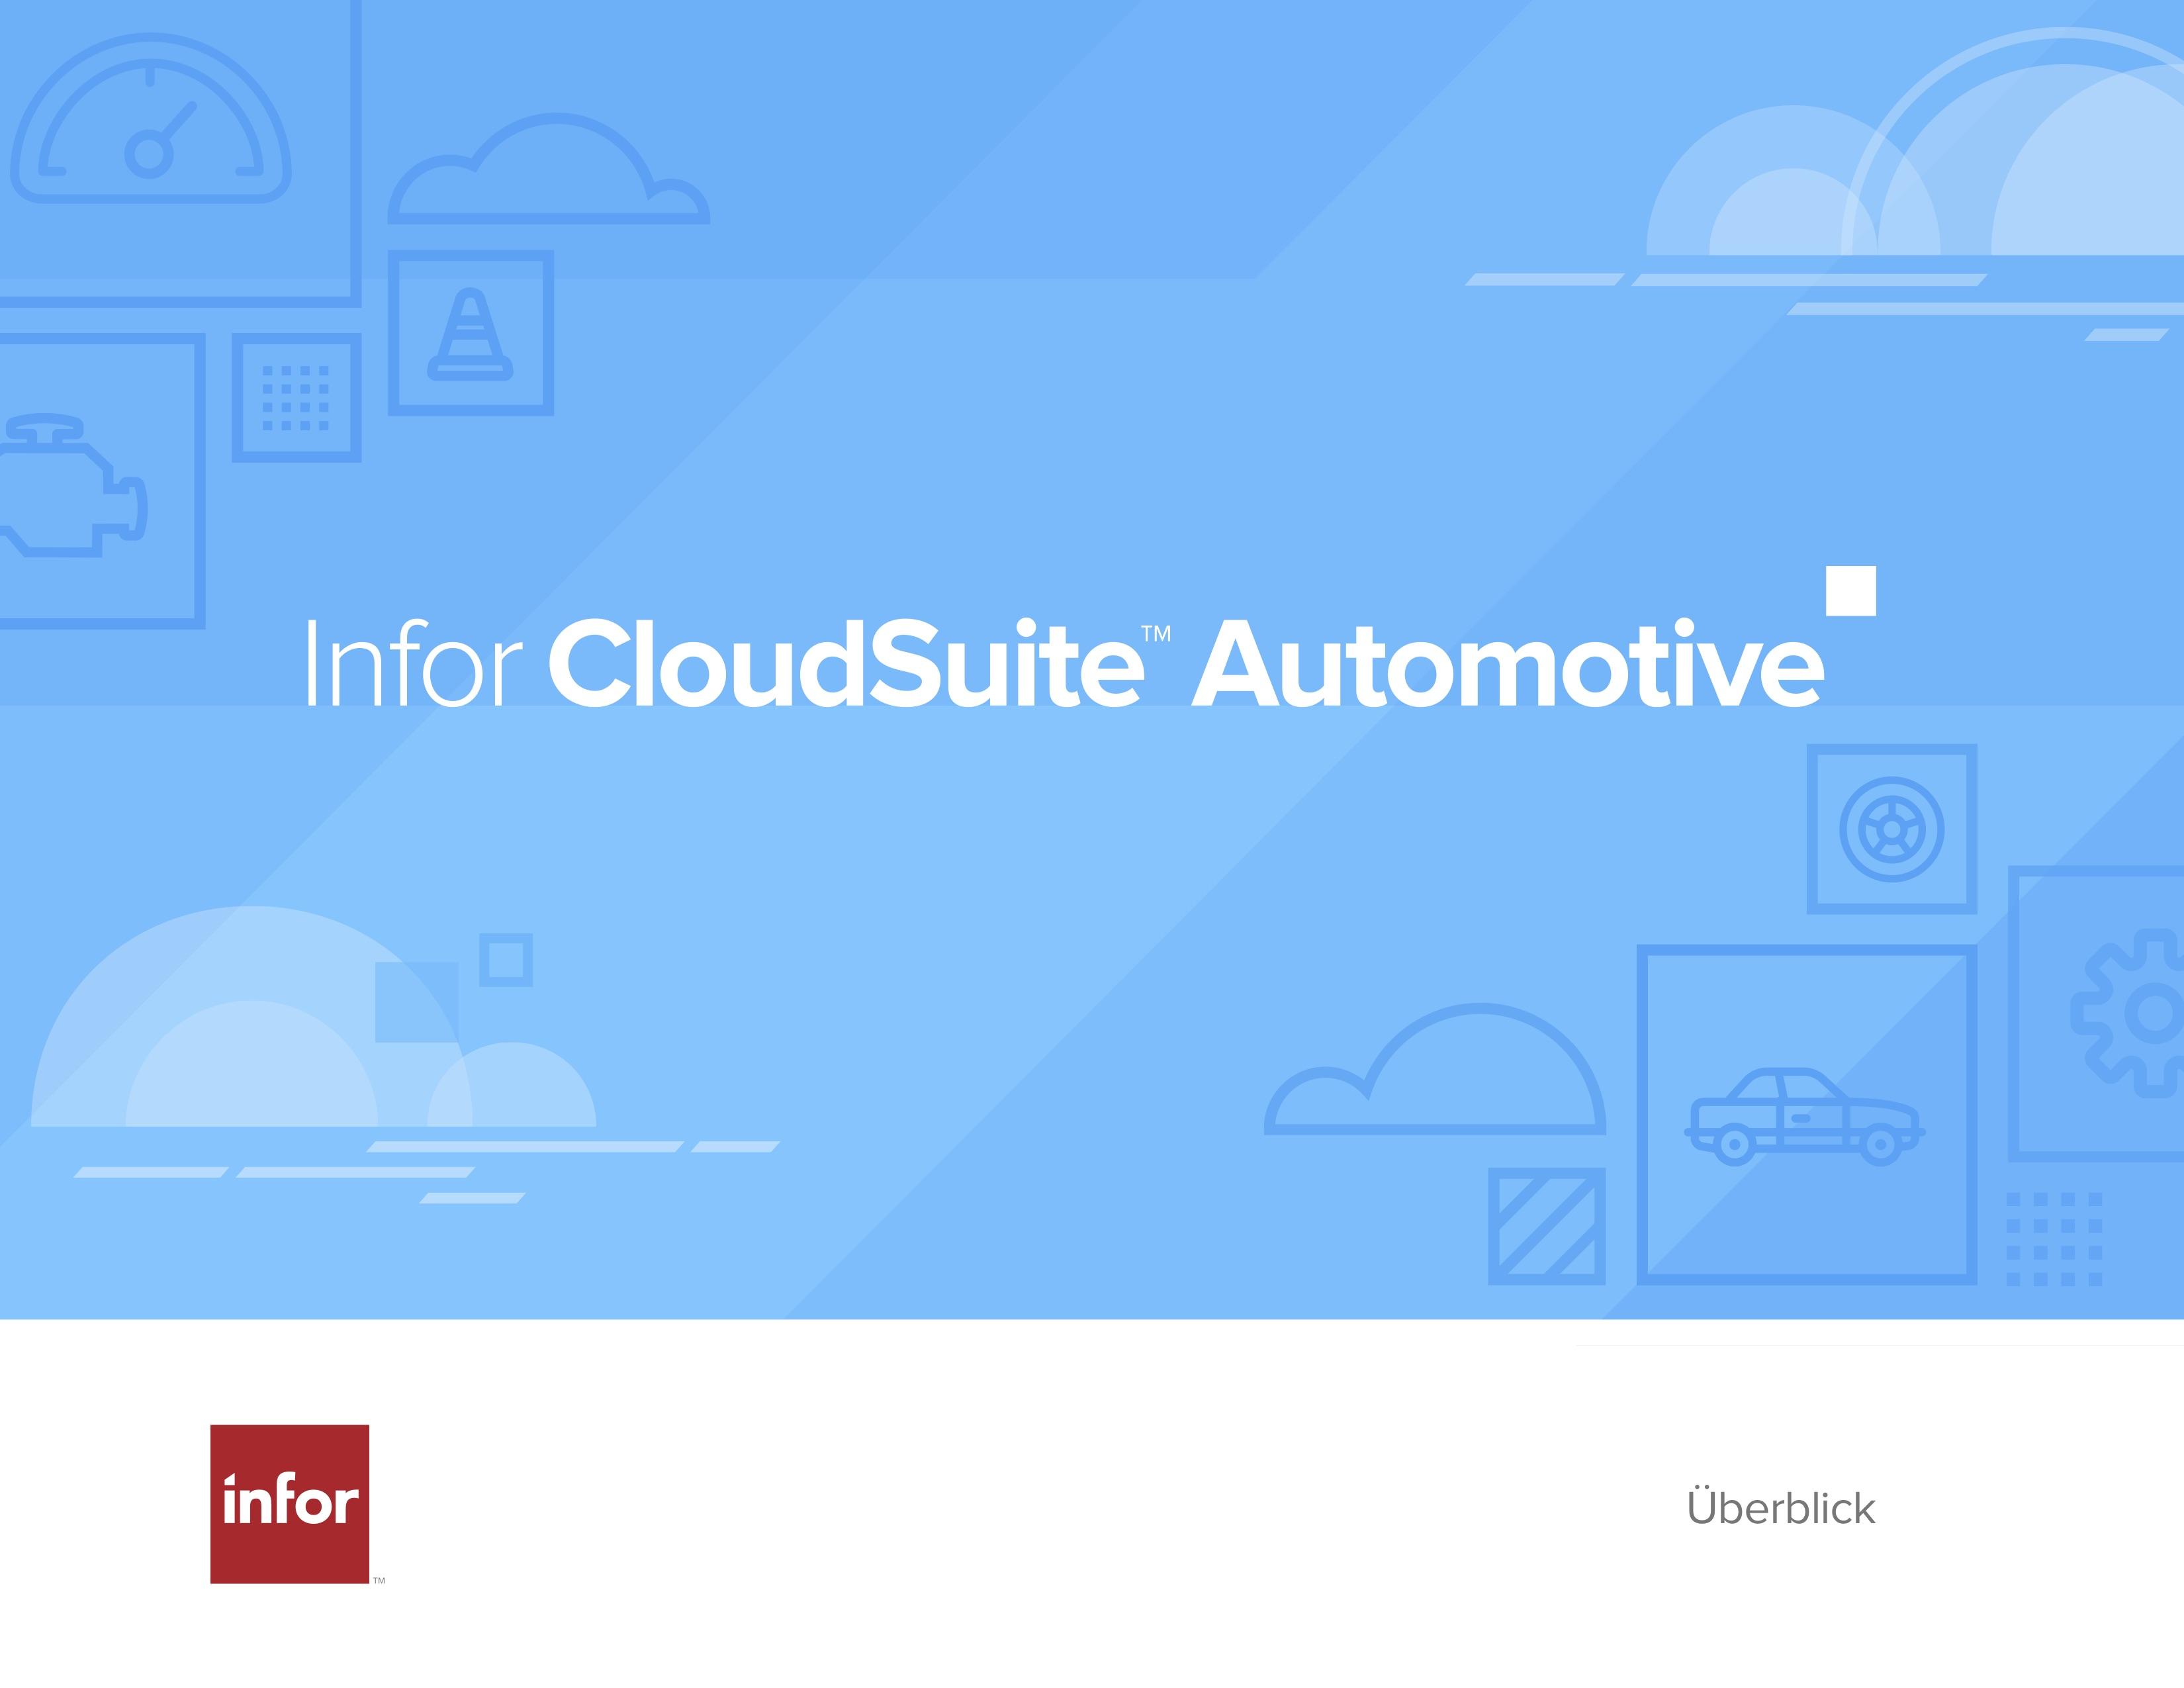 Square cropped infor cloudsuite automotivecover 9318093315e82937